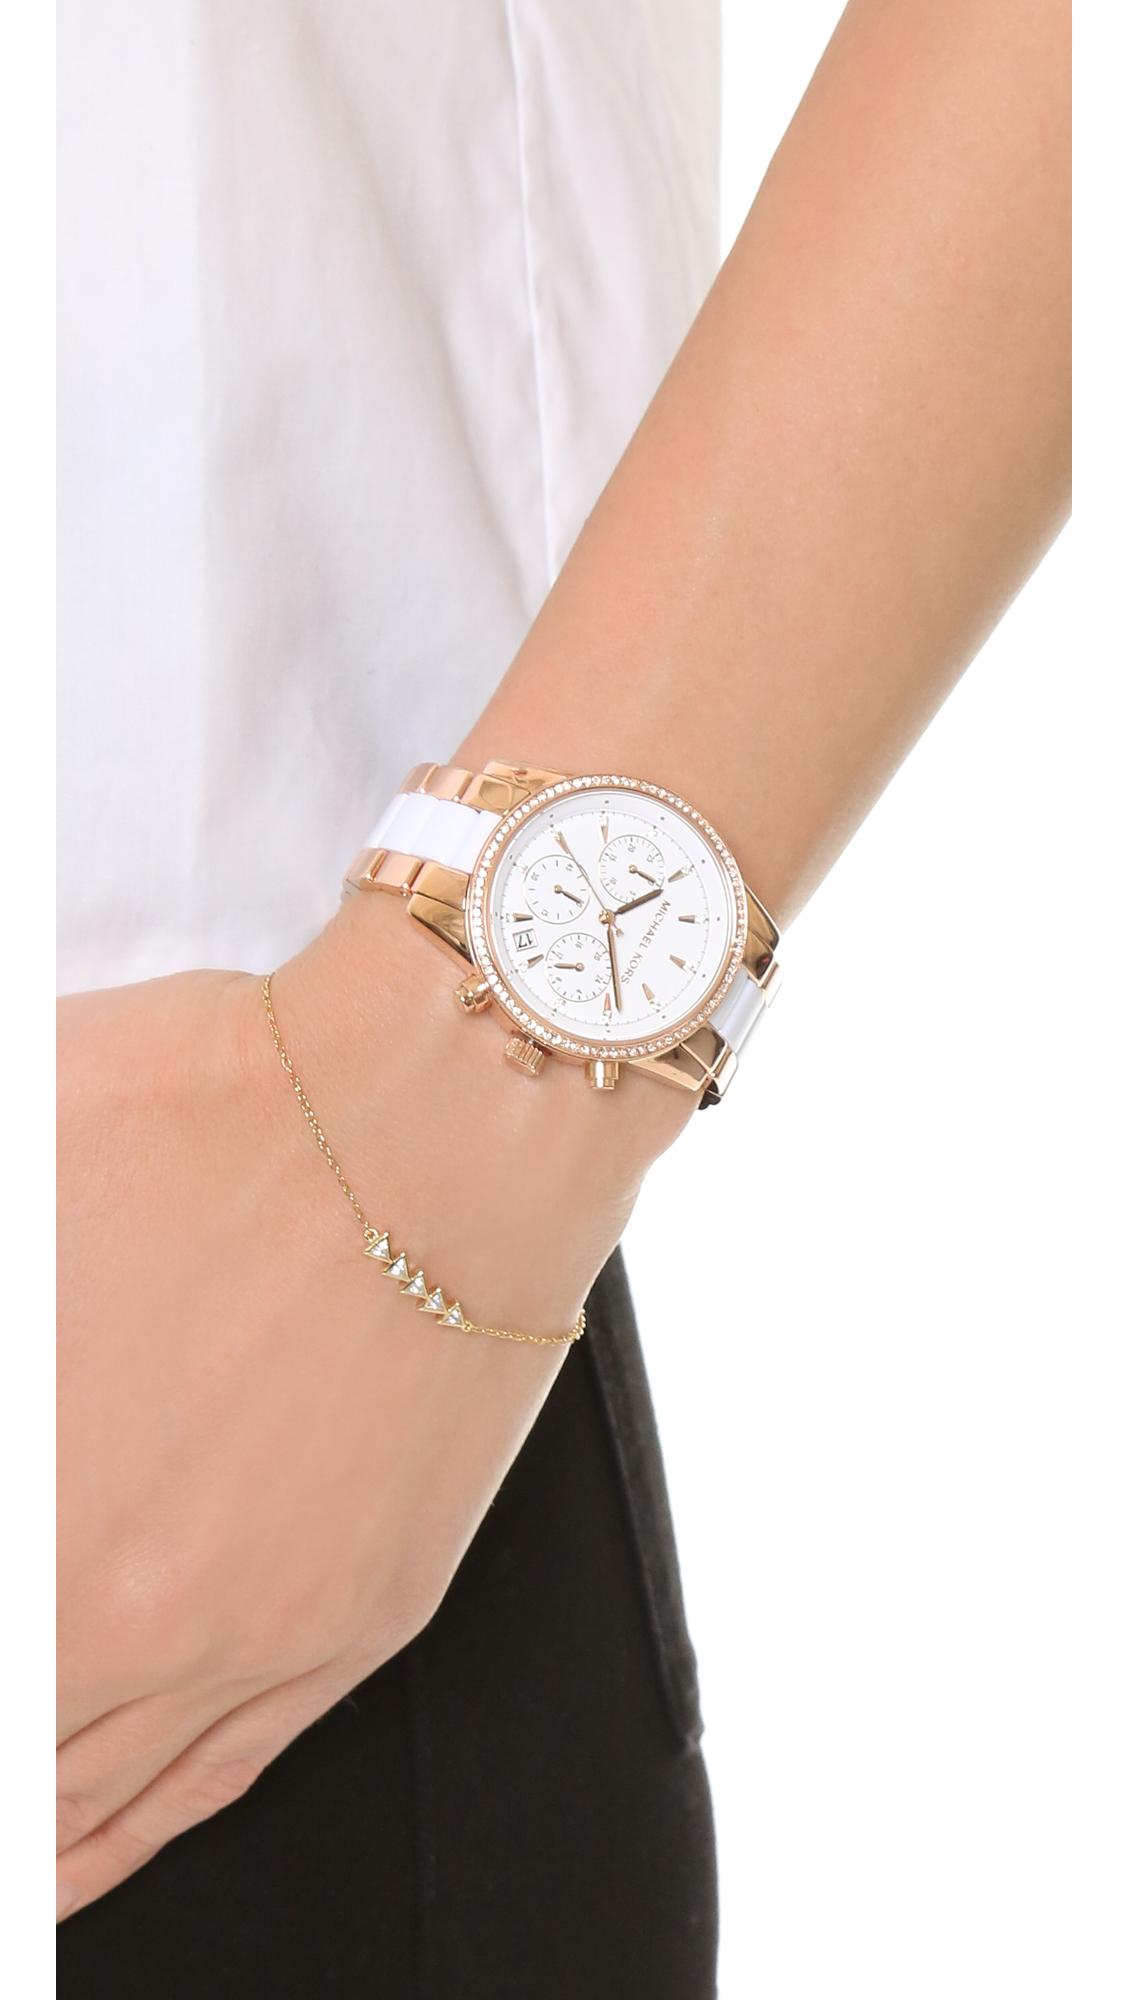 588cffd0f46 Lyst - Michael Kors Ritz Watch in Pink